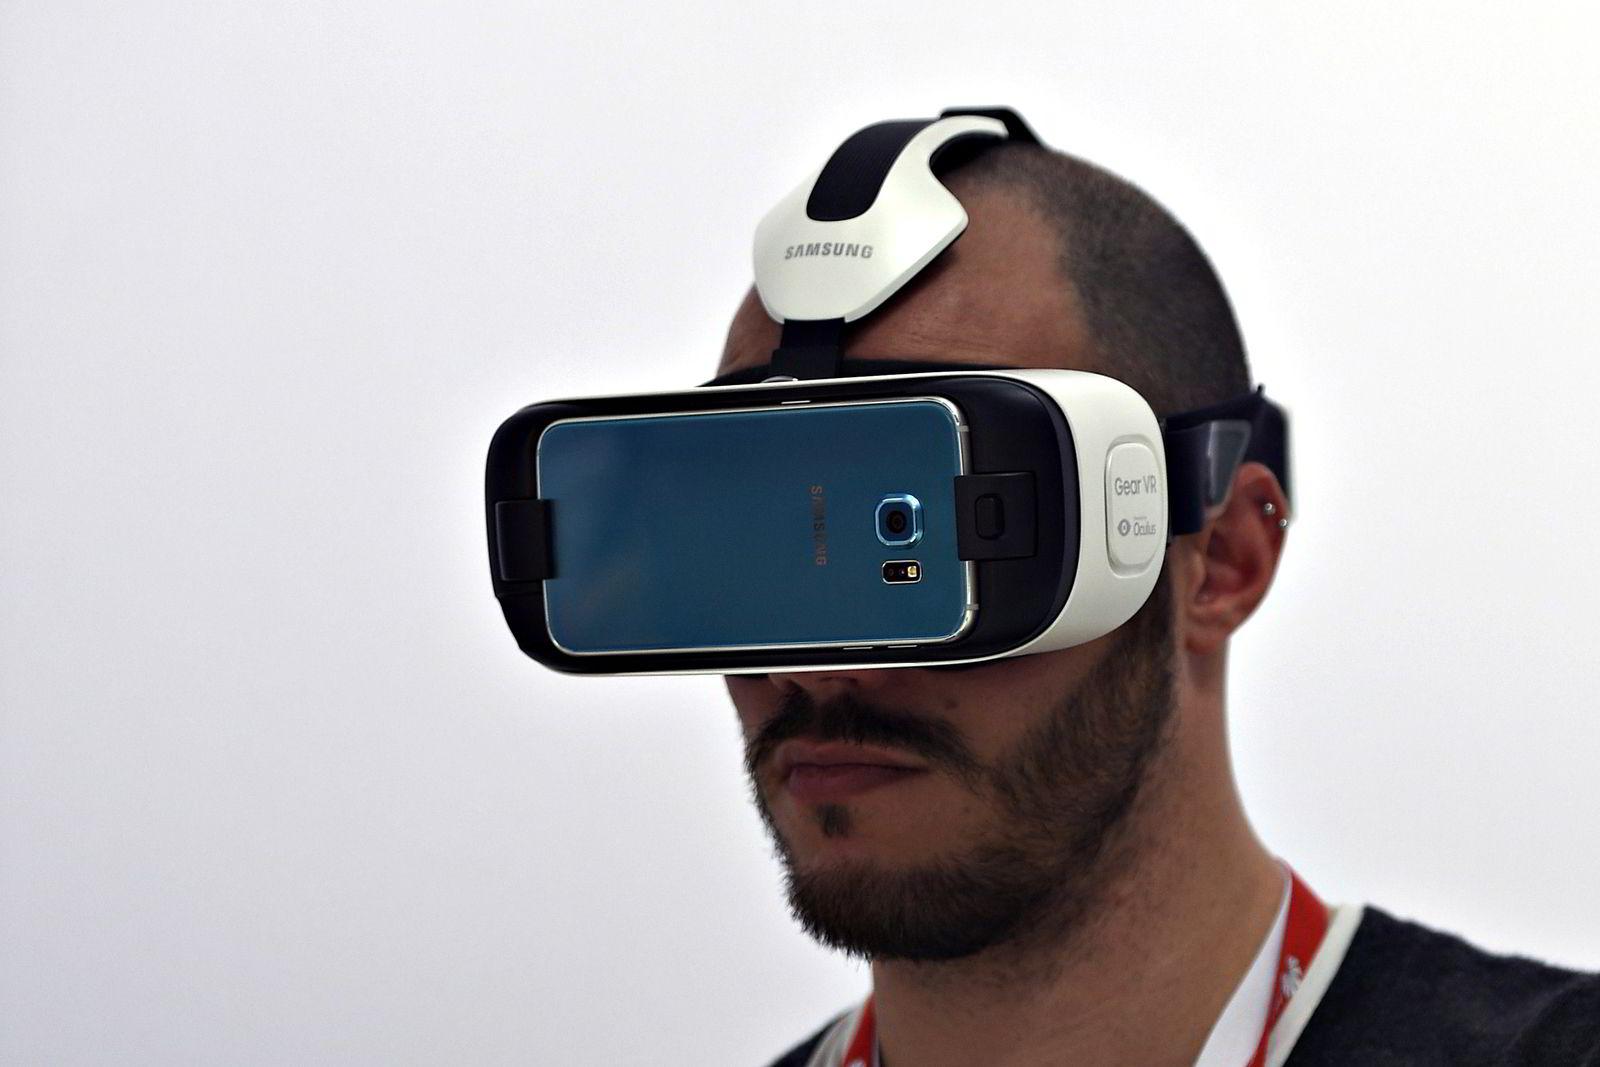 02.02.15: Slik ser Gear VR ut i bruk. Foto: SCANPIX / AFP PHOTO / LLUIS GENE